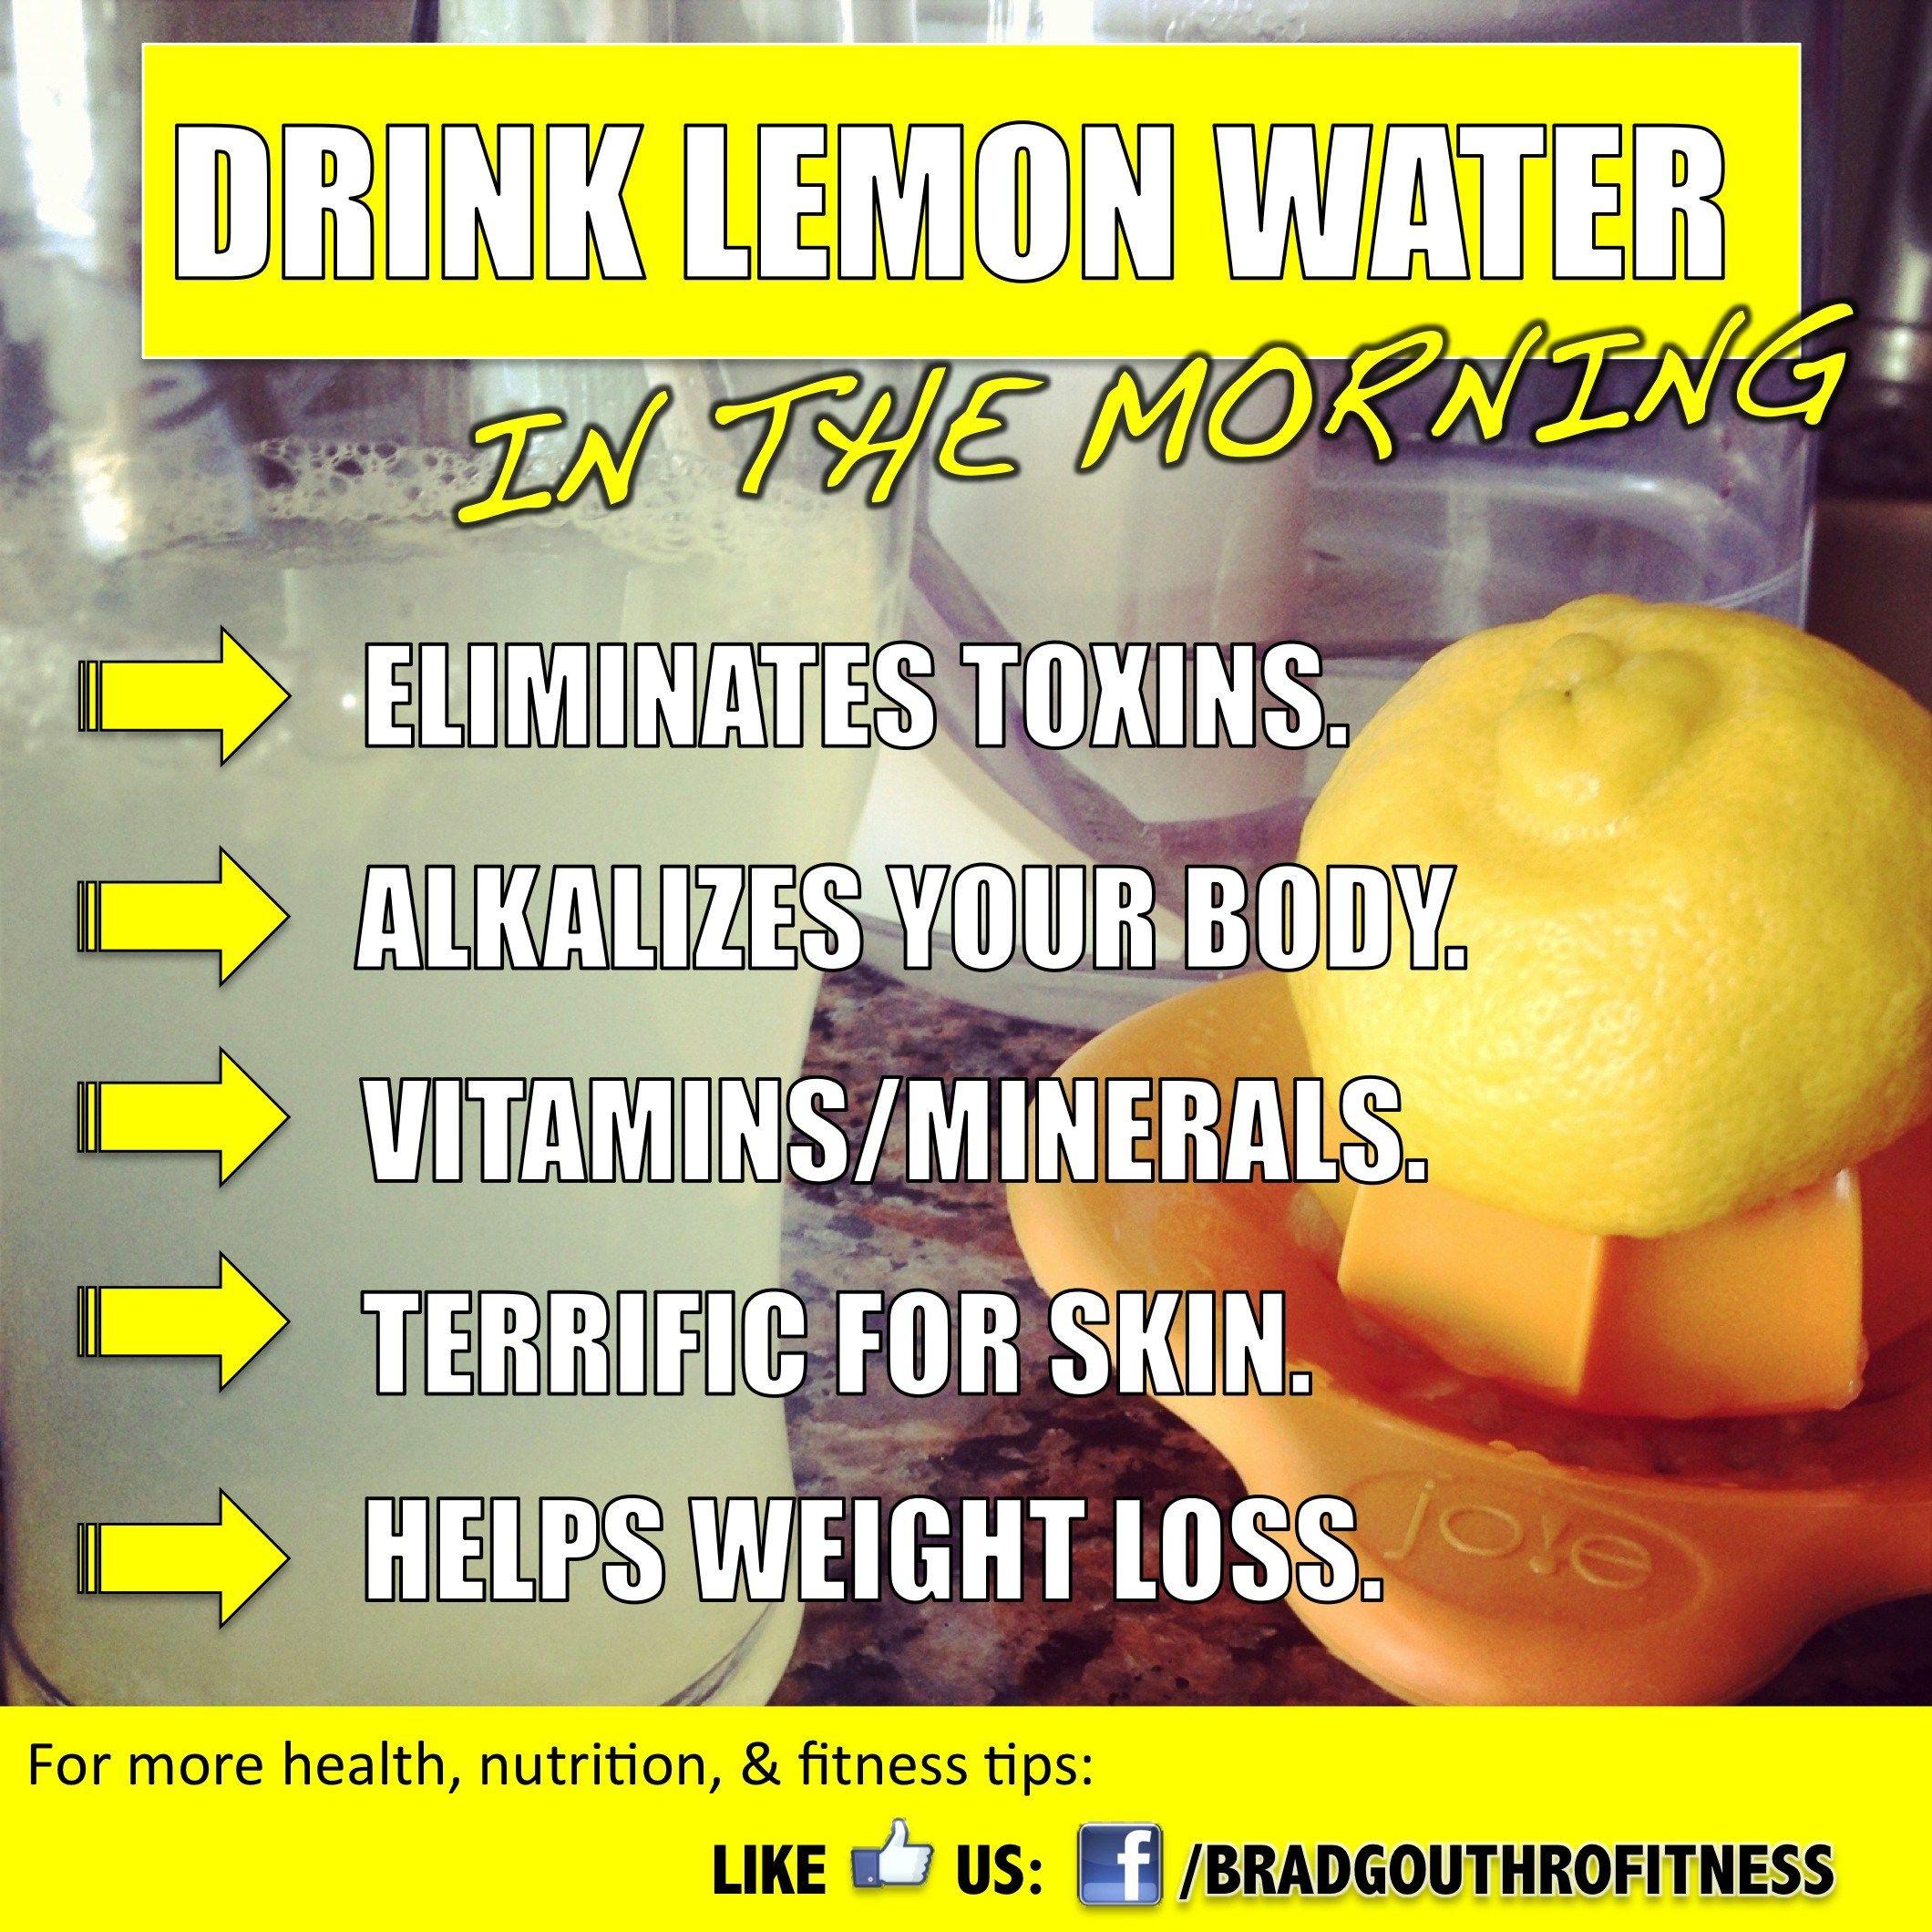 benefits of drinking lemon water